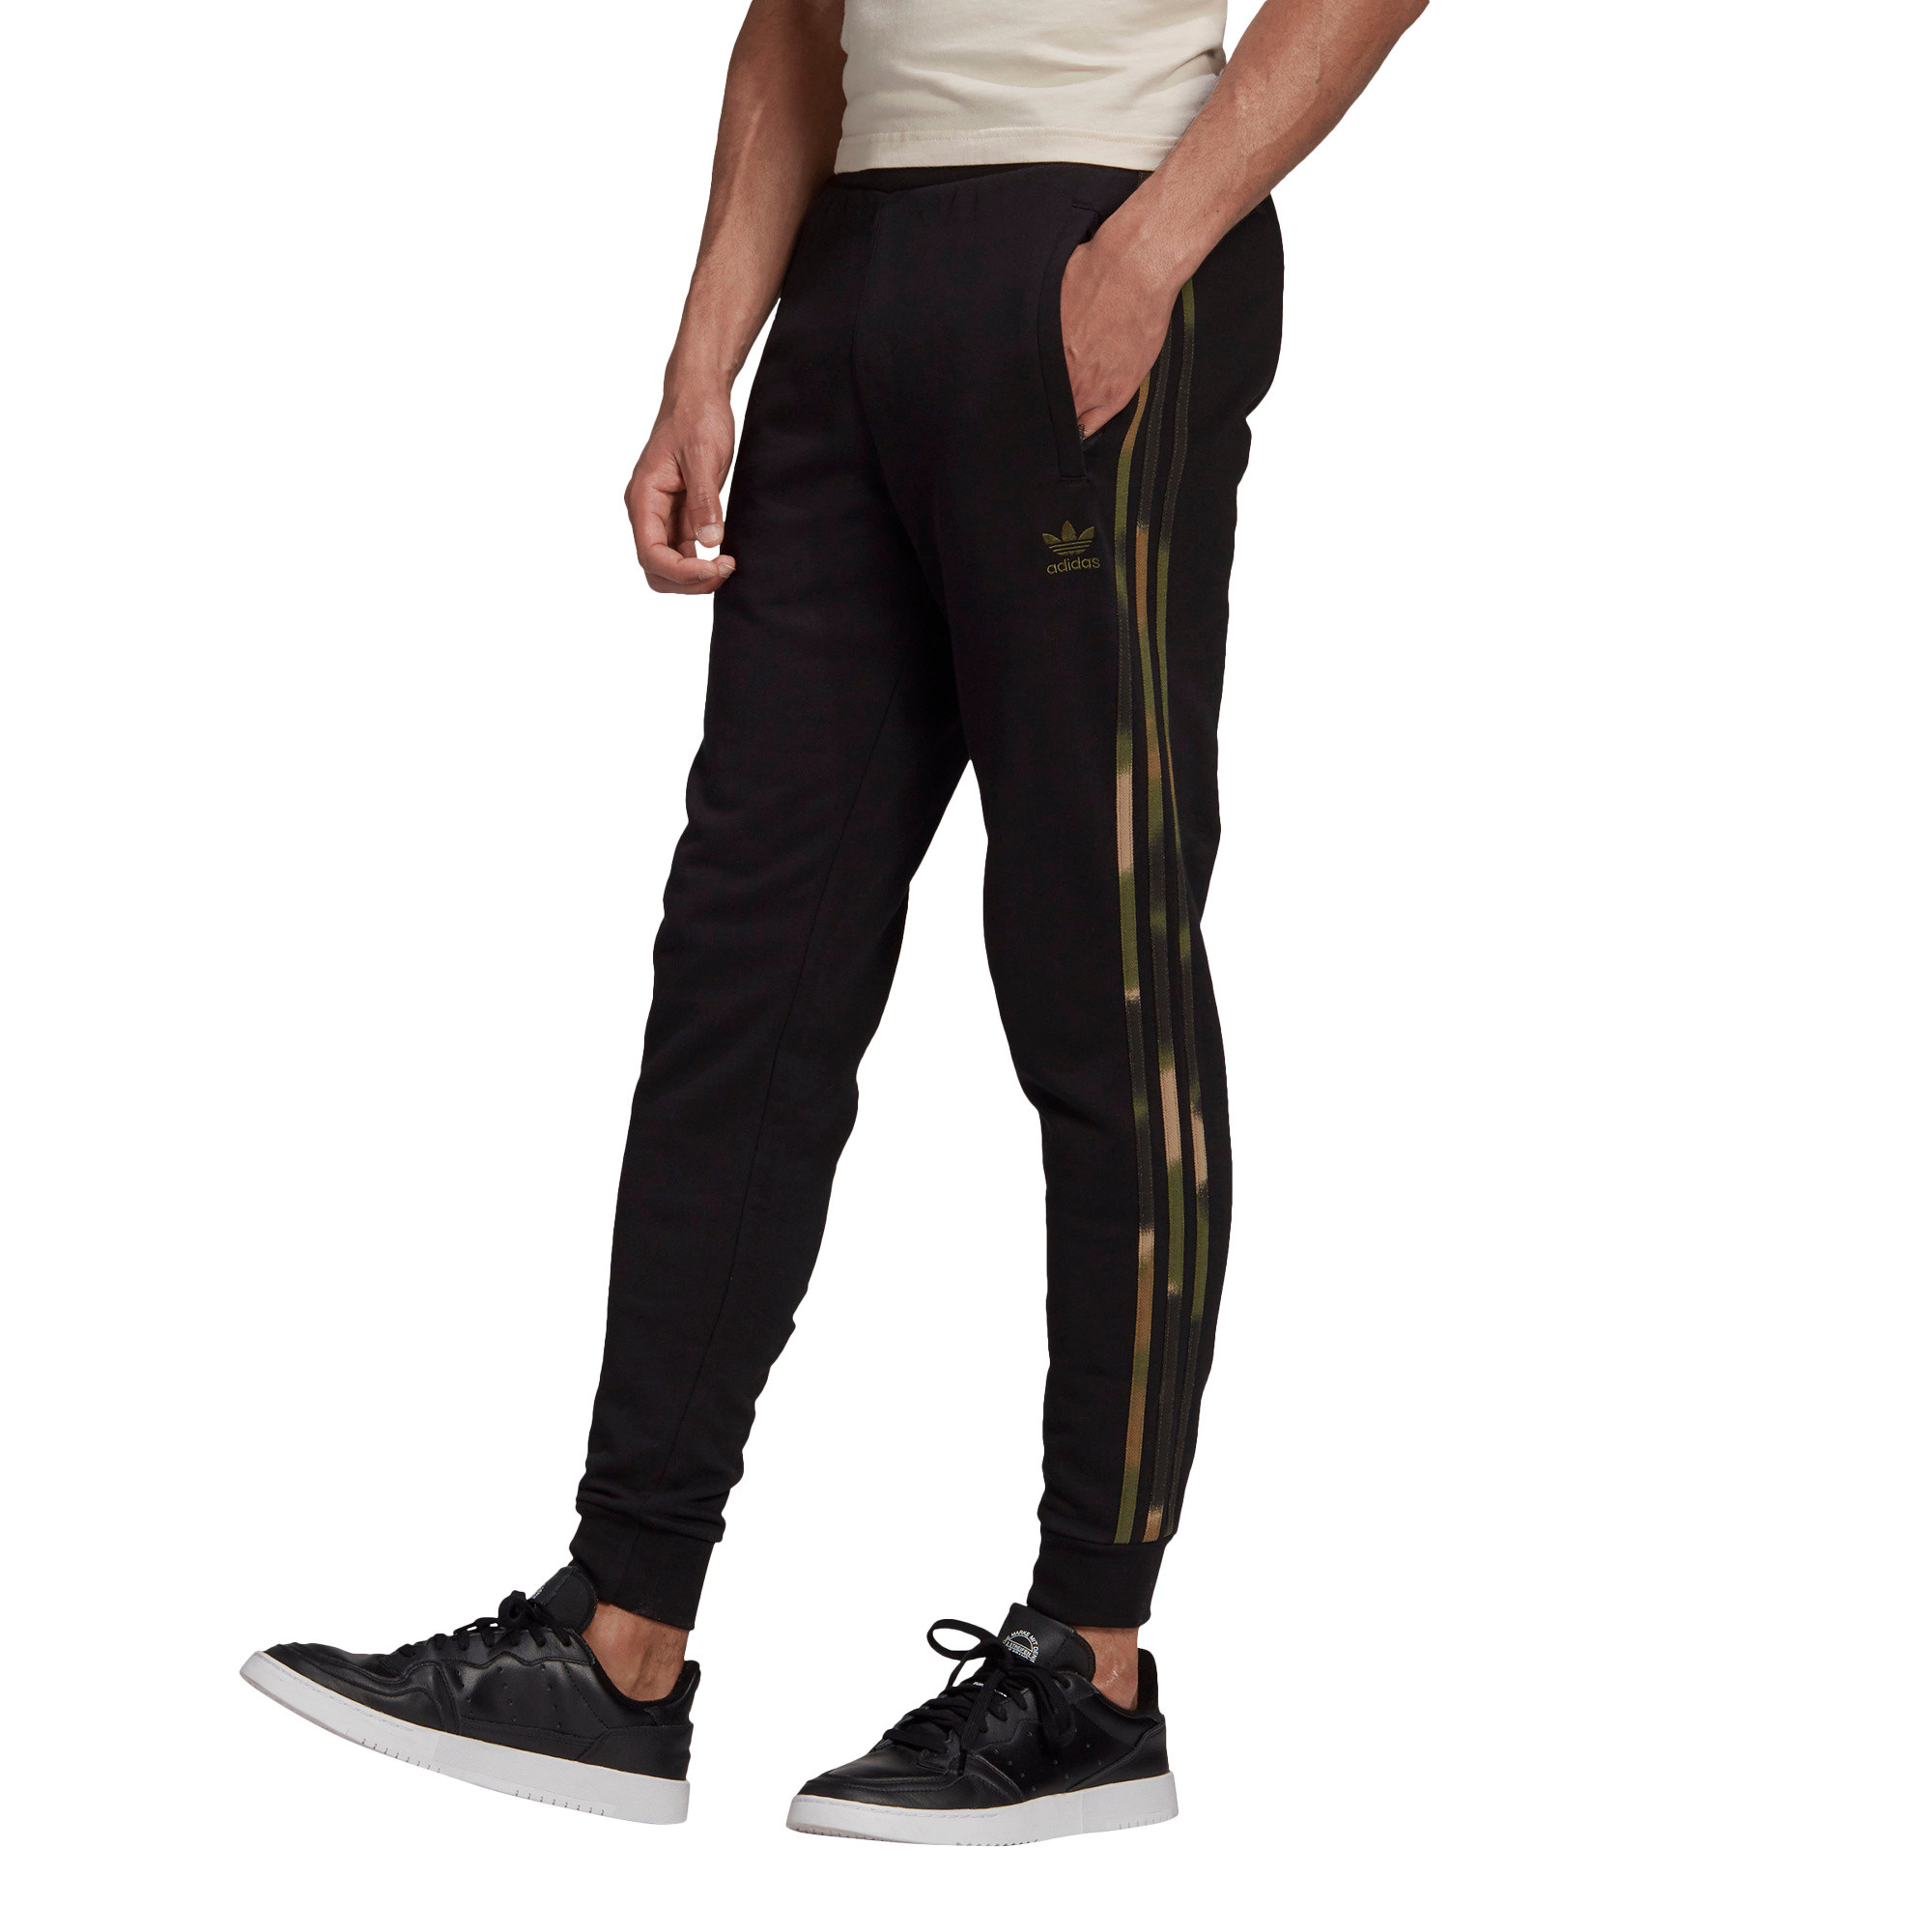 Pantaloni tuta Camo Stripes, Multicolor, large image number 2